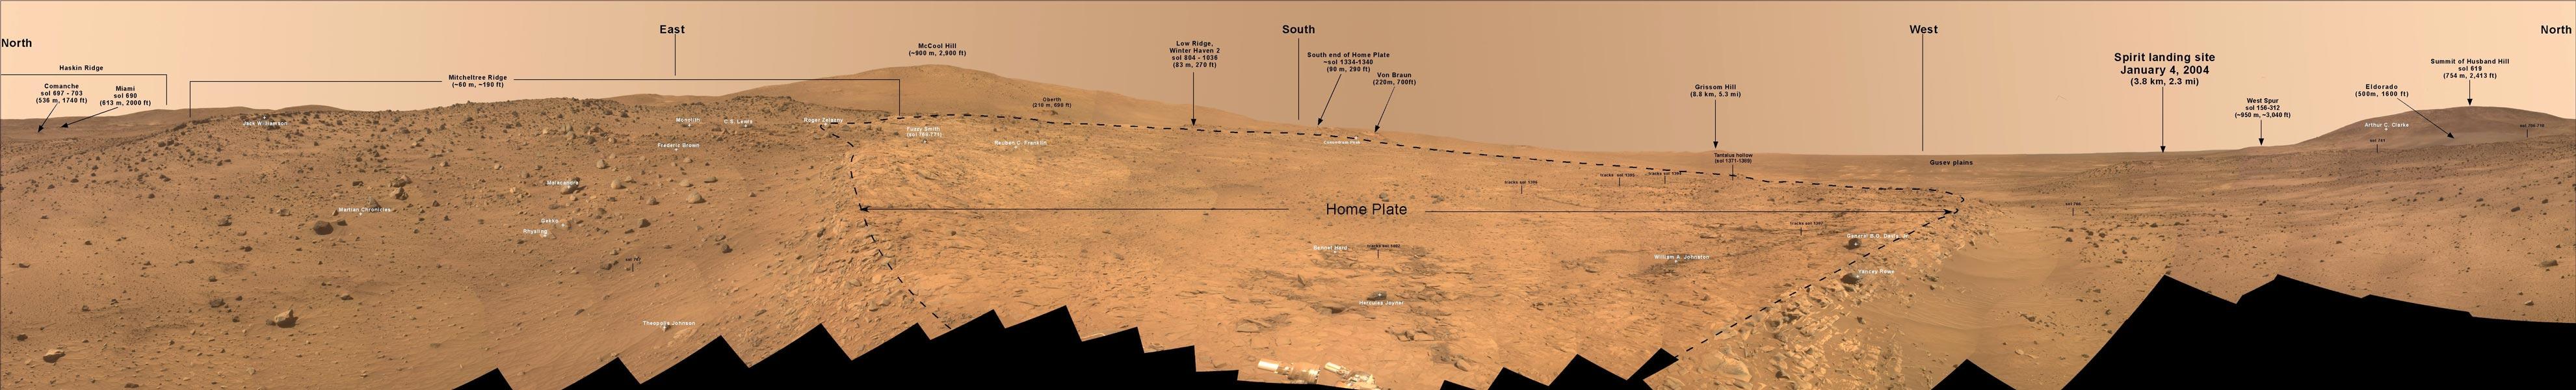 Panorámica de Bonestell desde Mars